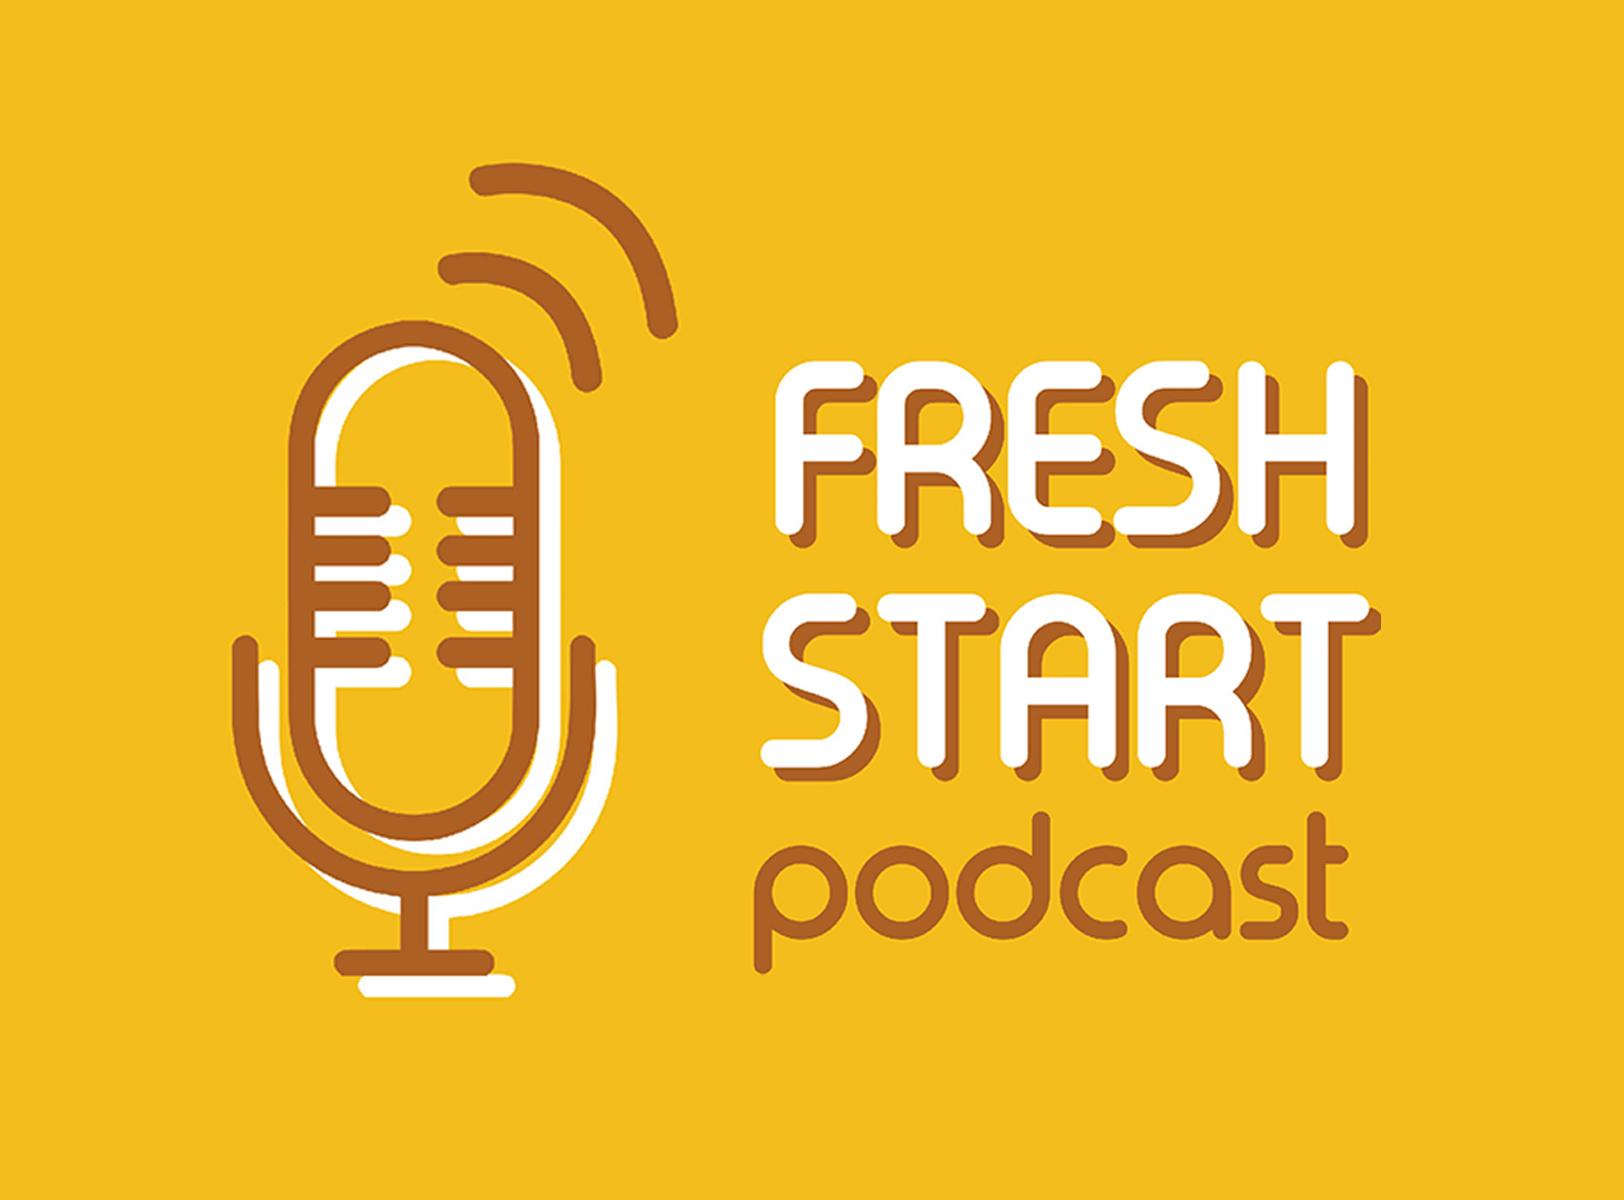 Fresh Start: Podcast News (2/25/2019 Mon.)